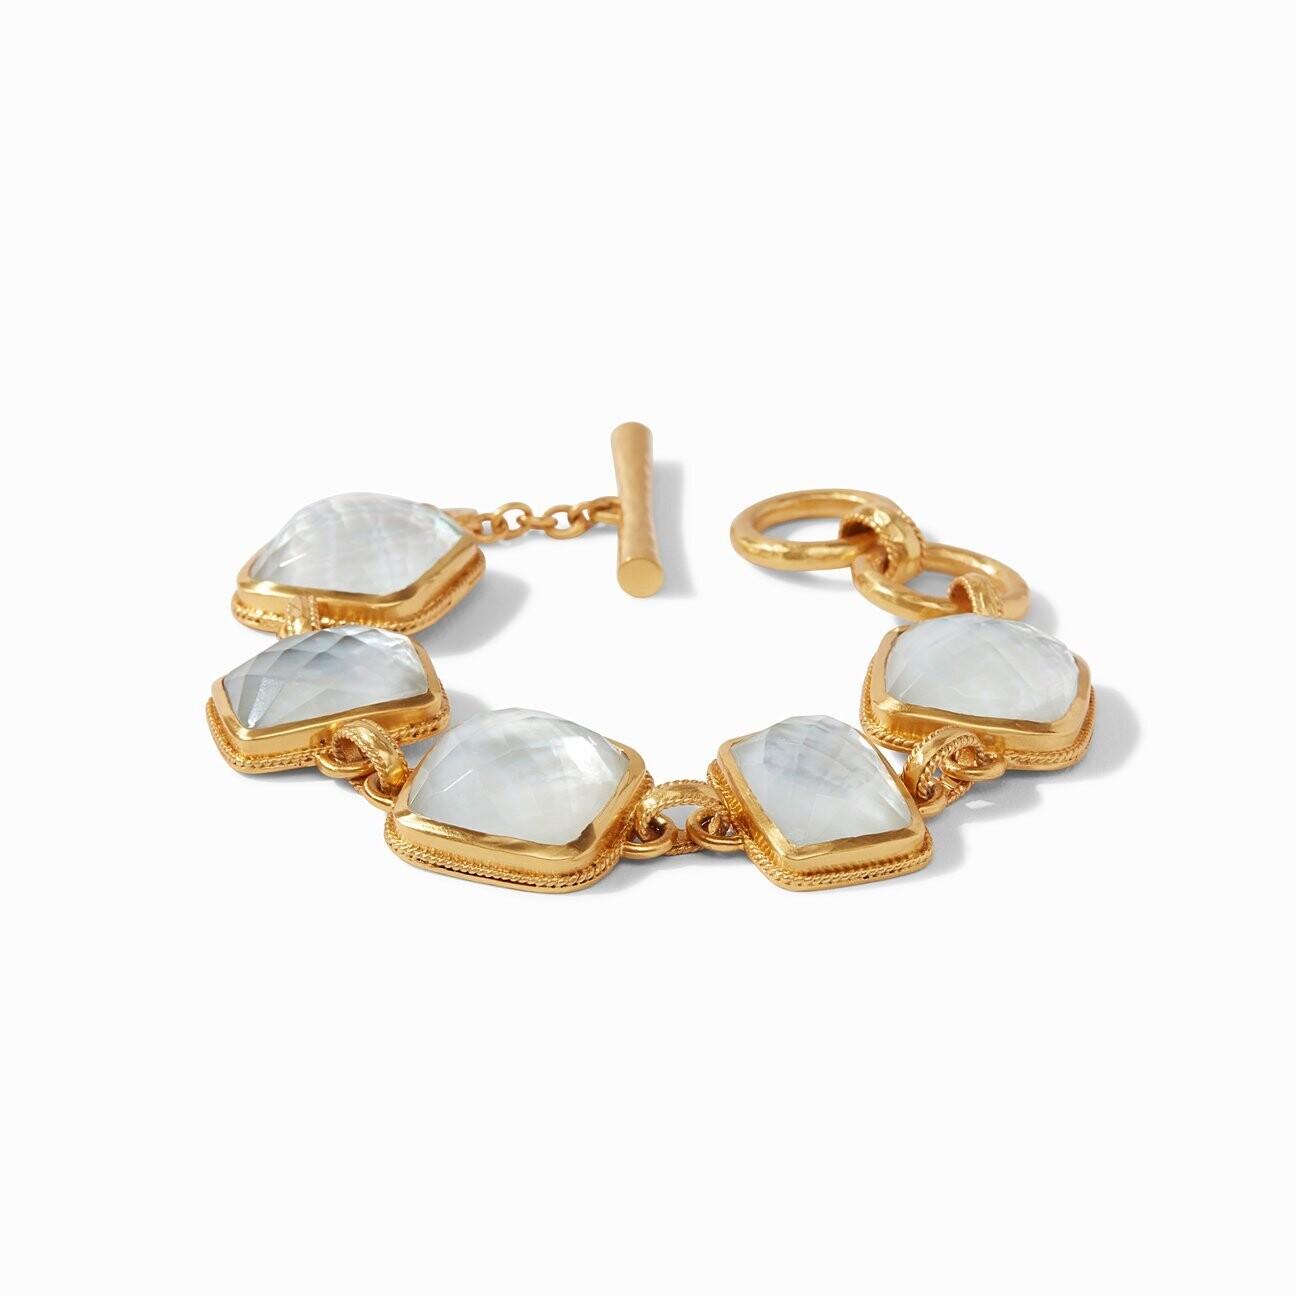 JULIE VOS Savoy Bracelet, Iridescent Clear Crystal